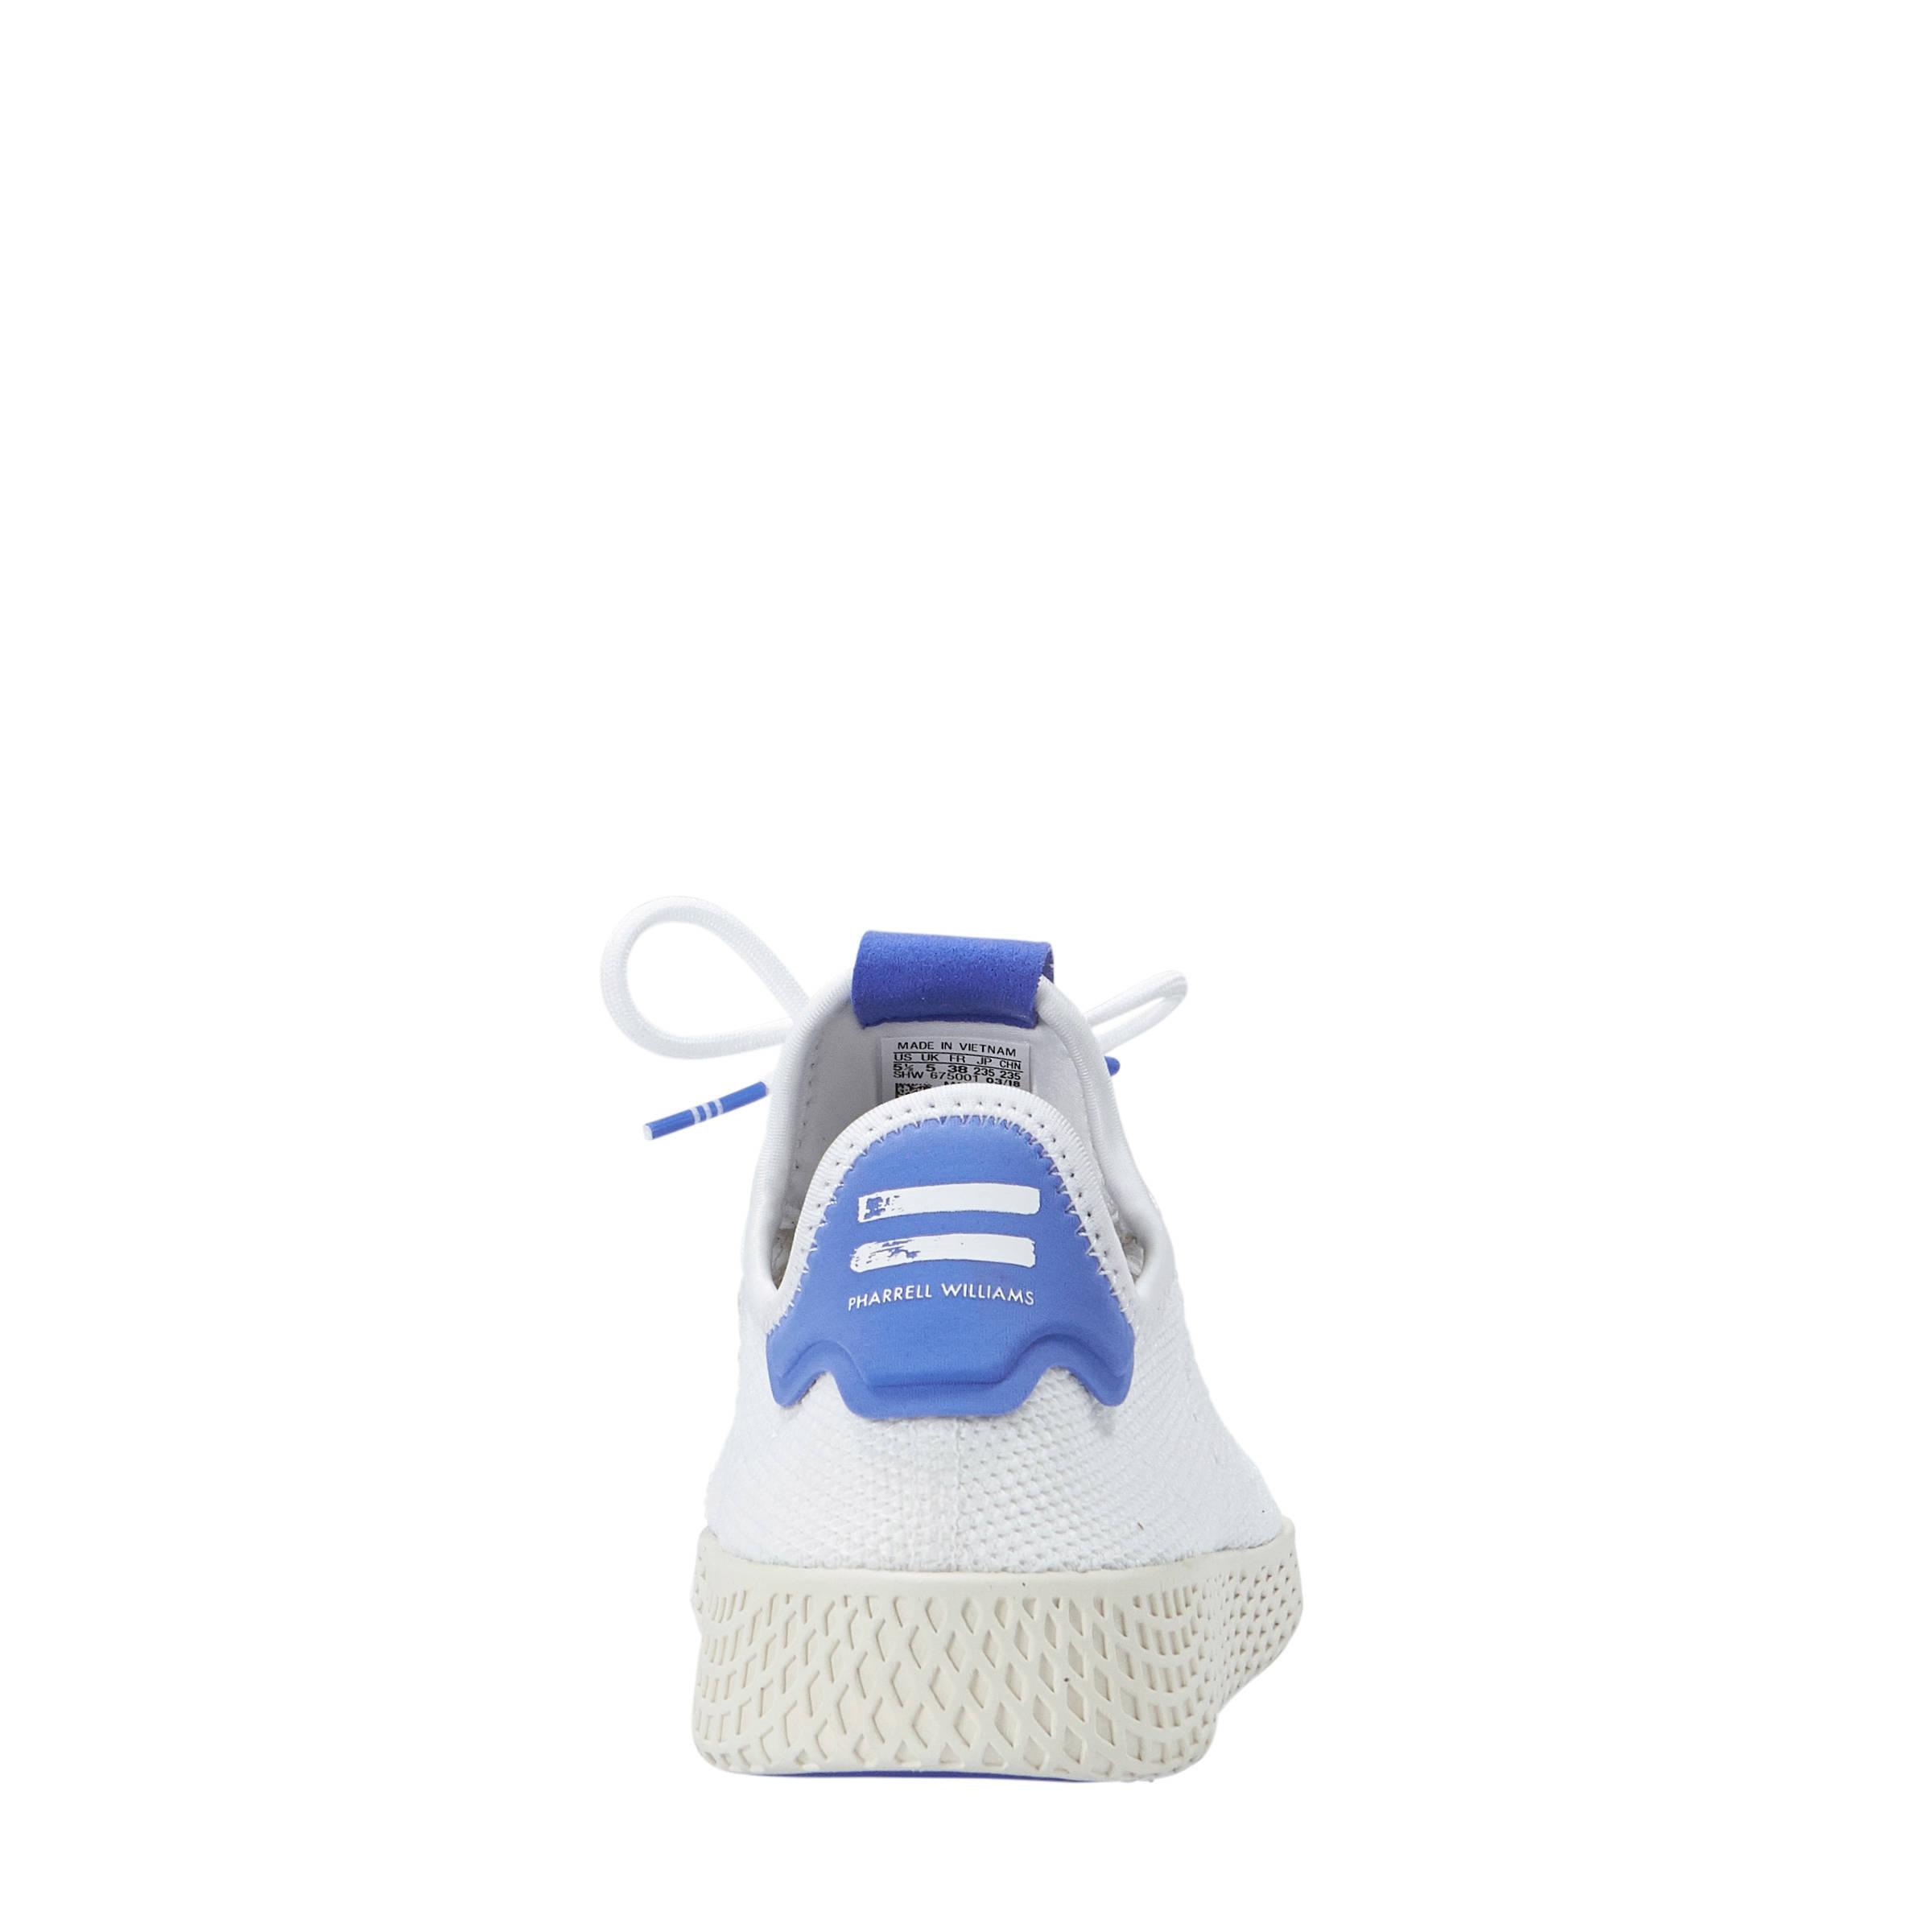 0bd6af674013d adidas originals PW TENNIS HU sneakers